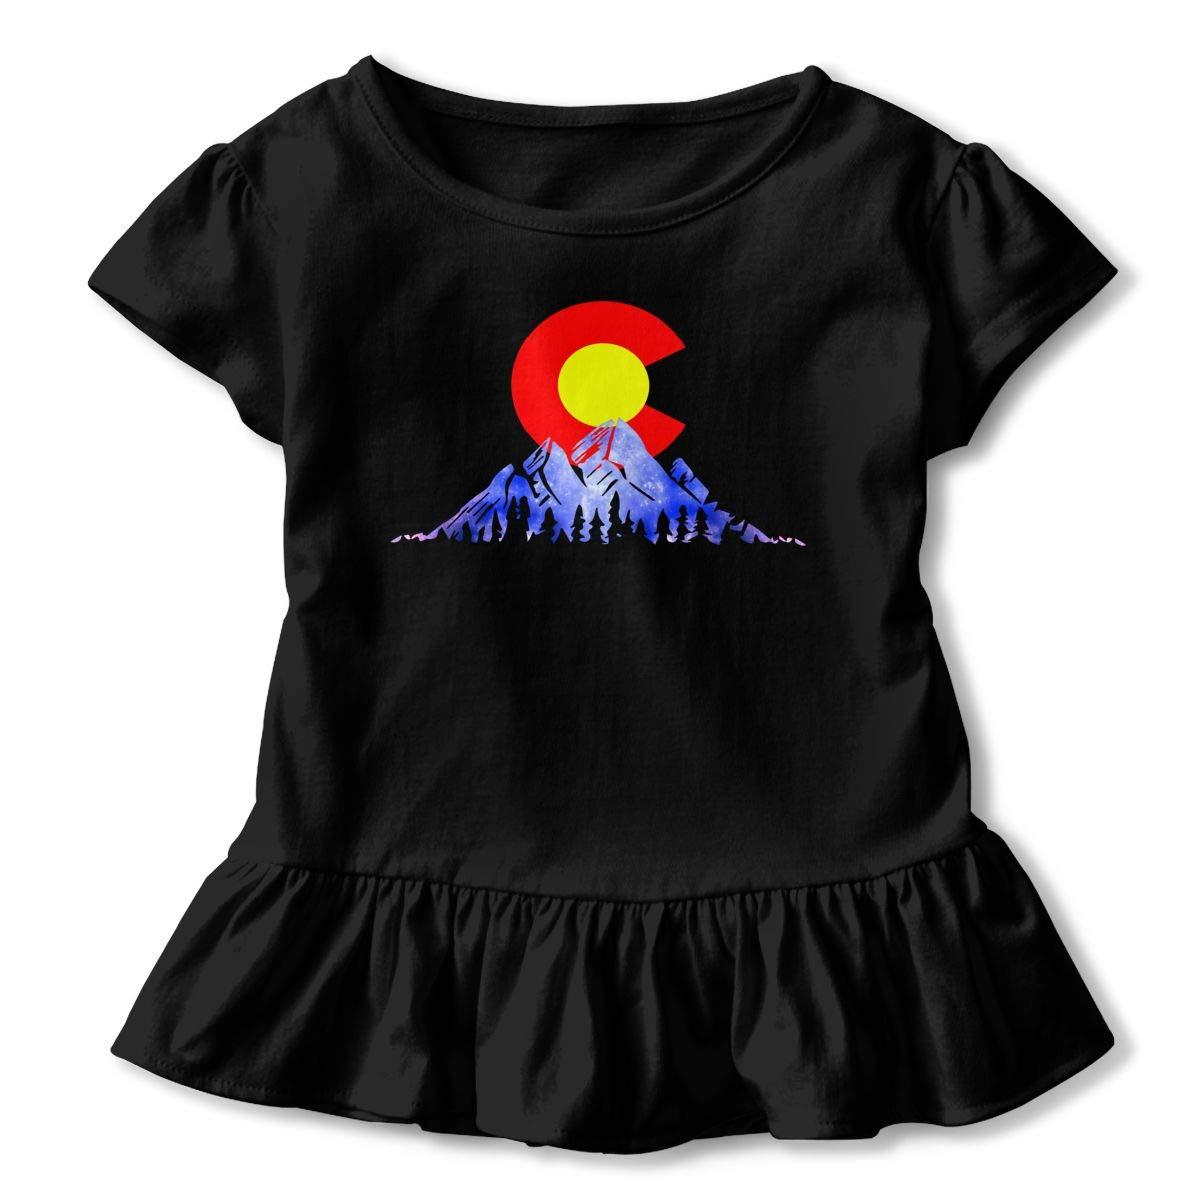 Retro Vintage Colorado Mountain Toddler Baby Girls Short Sleeve Ruffle T-Shirt